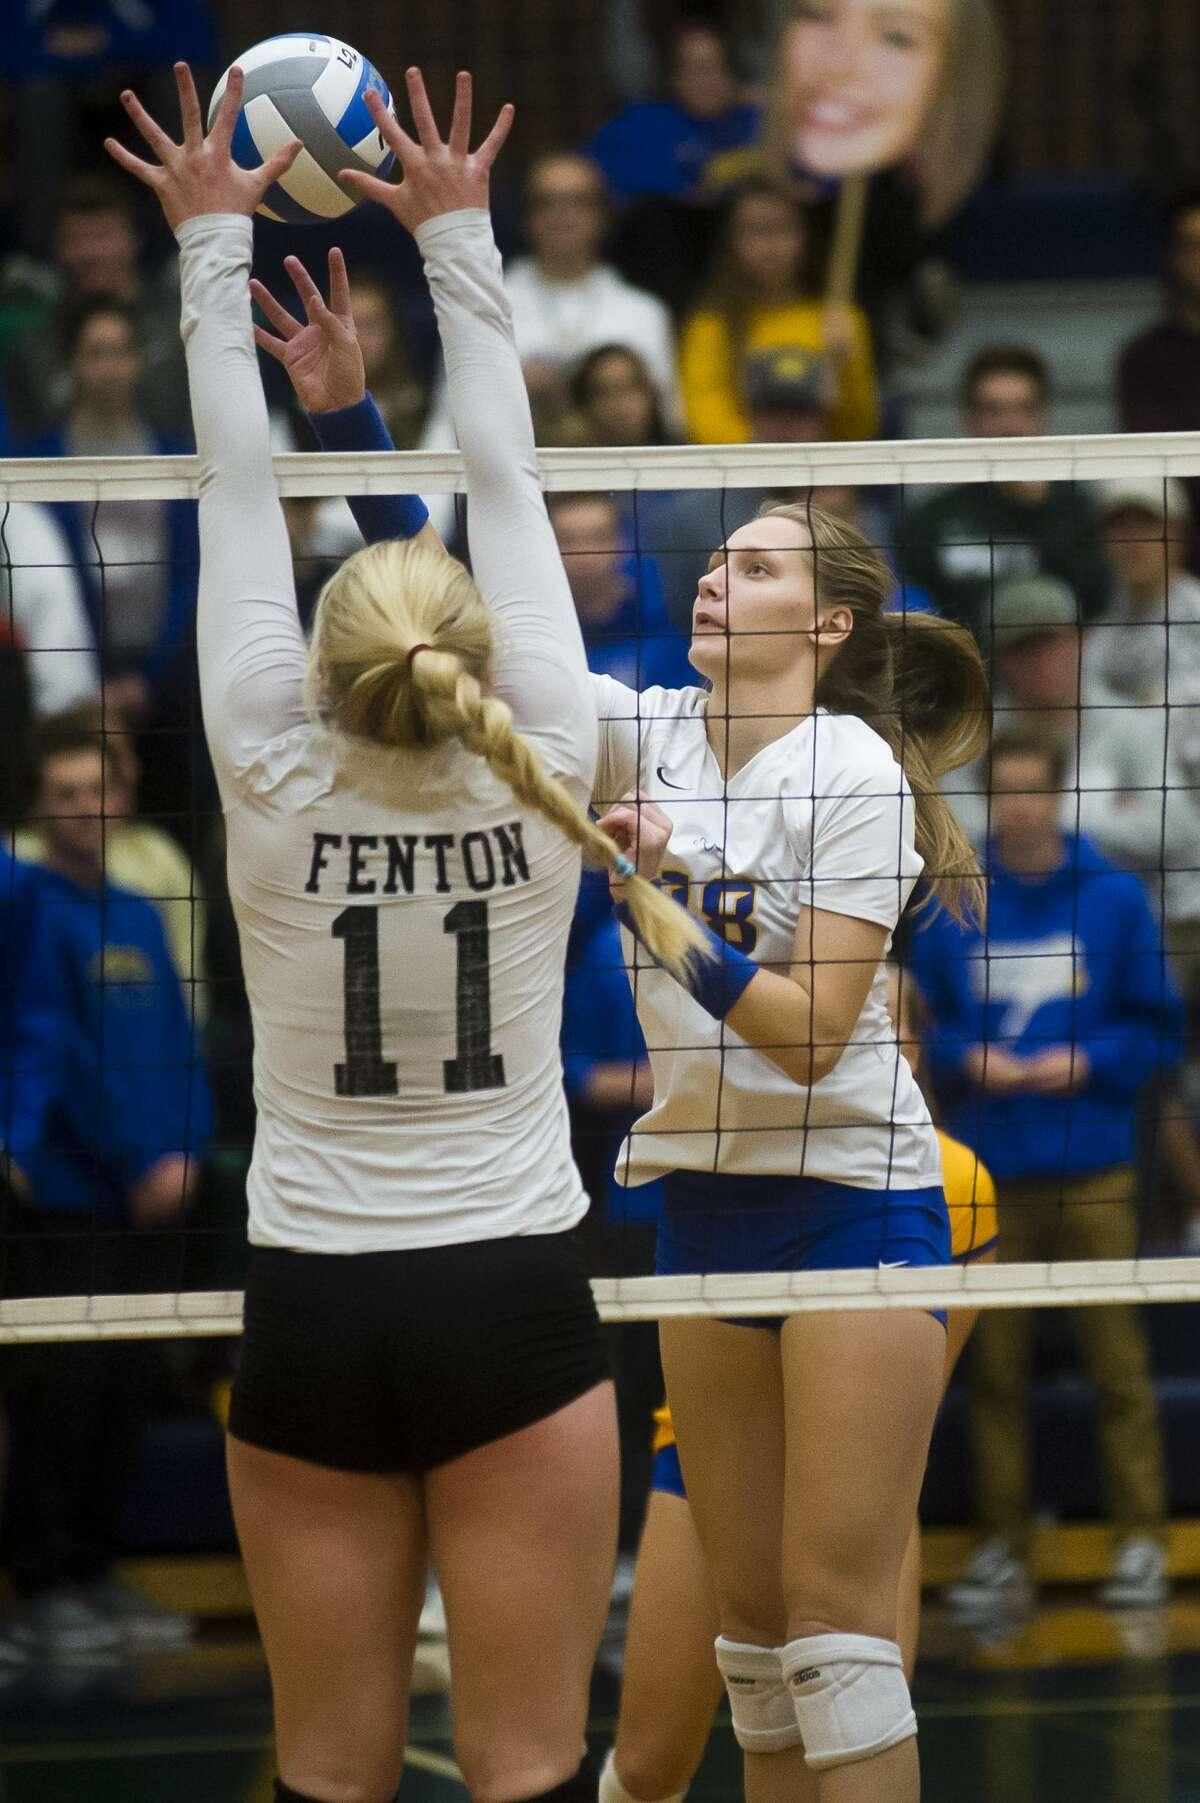 Midland senior Bethany Wilson tips the ball over the net during the Chemics' Class A regional final against Fenton on Thursday, Nov. 9, 2017 at Saginaw Heritage High School. (Katy Kildee/kkildee@mdn.net)